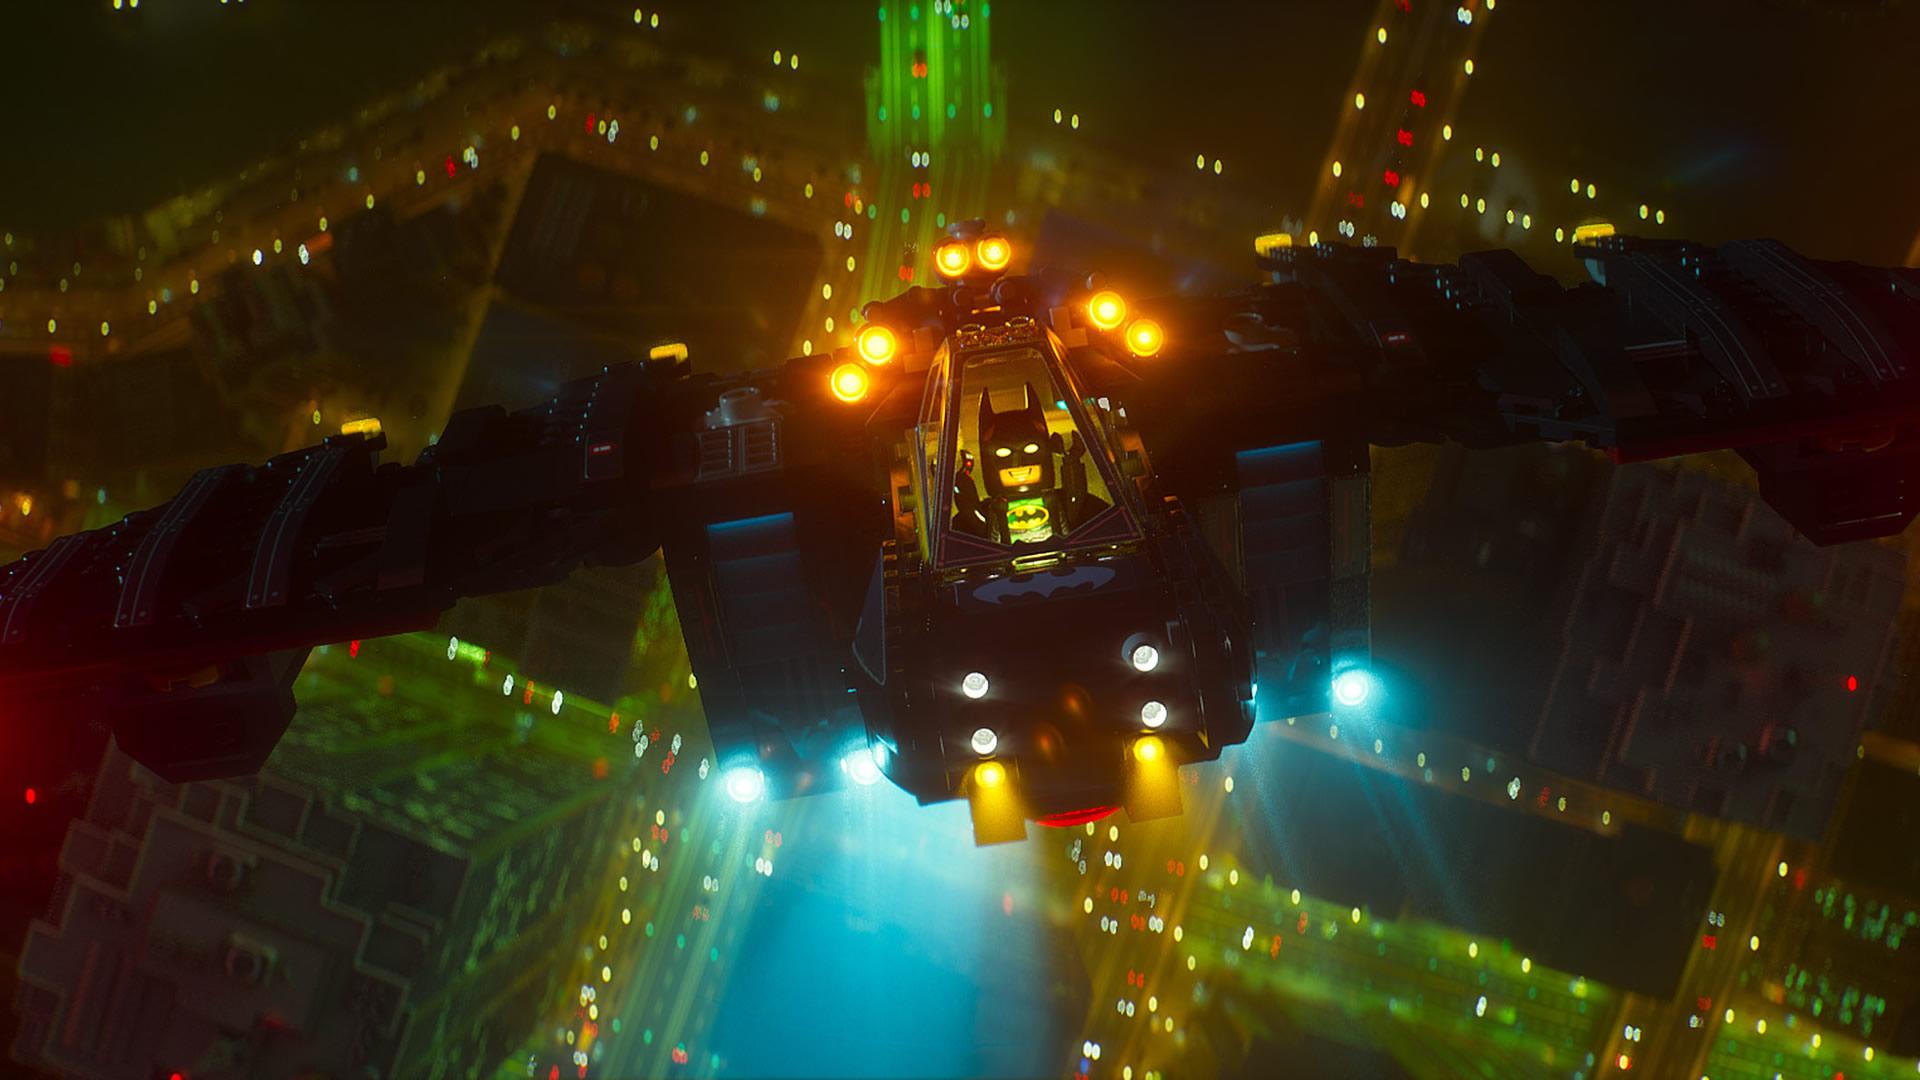 Lego Batman Wallpaper - Batman Movie Ultimate Batmobile , HD Wallpaper & Backgrounds